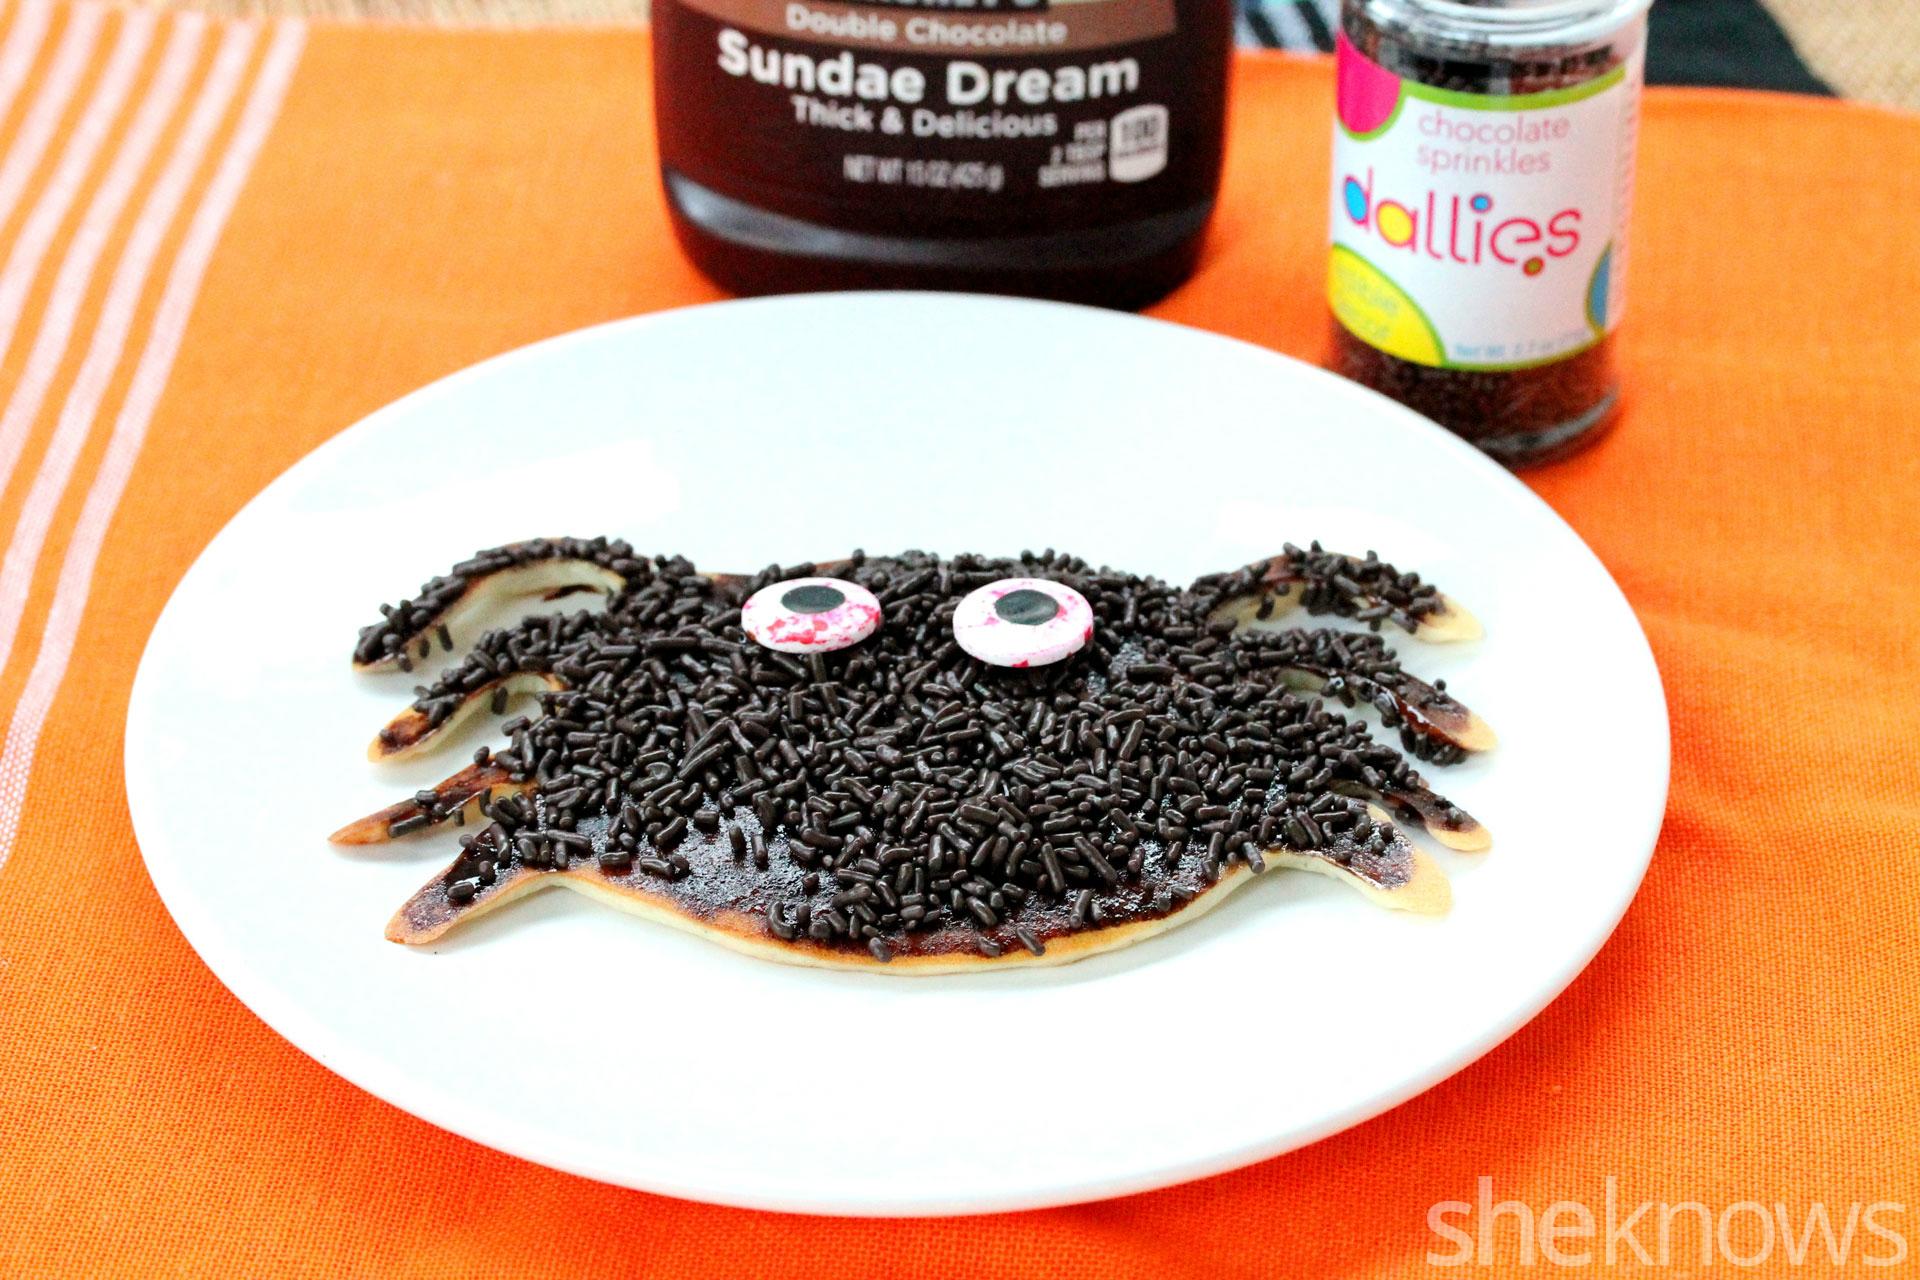 candy-spider-pancake